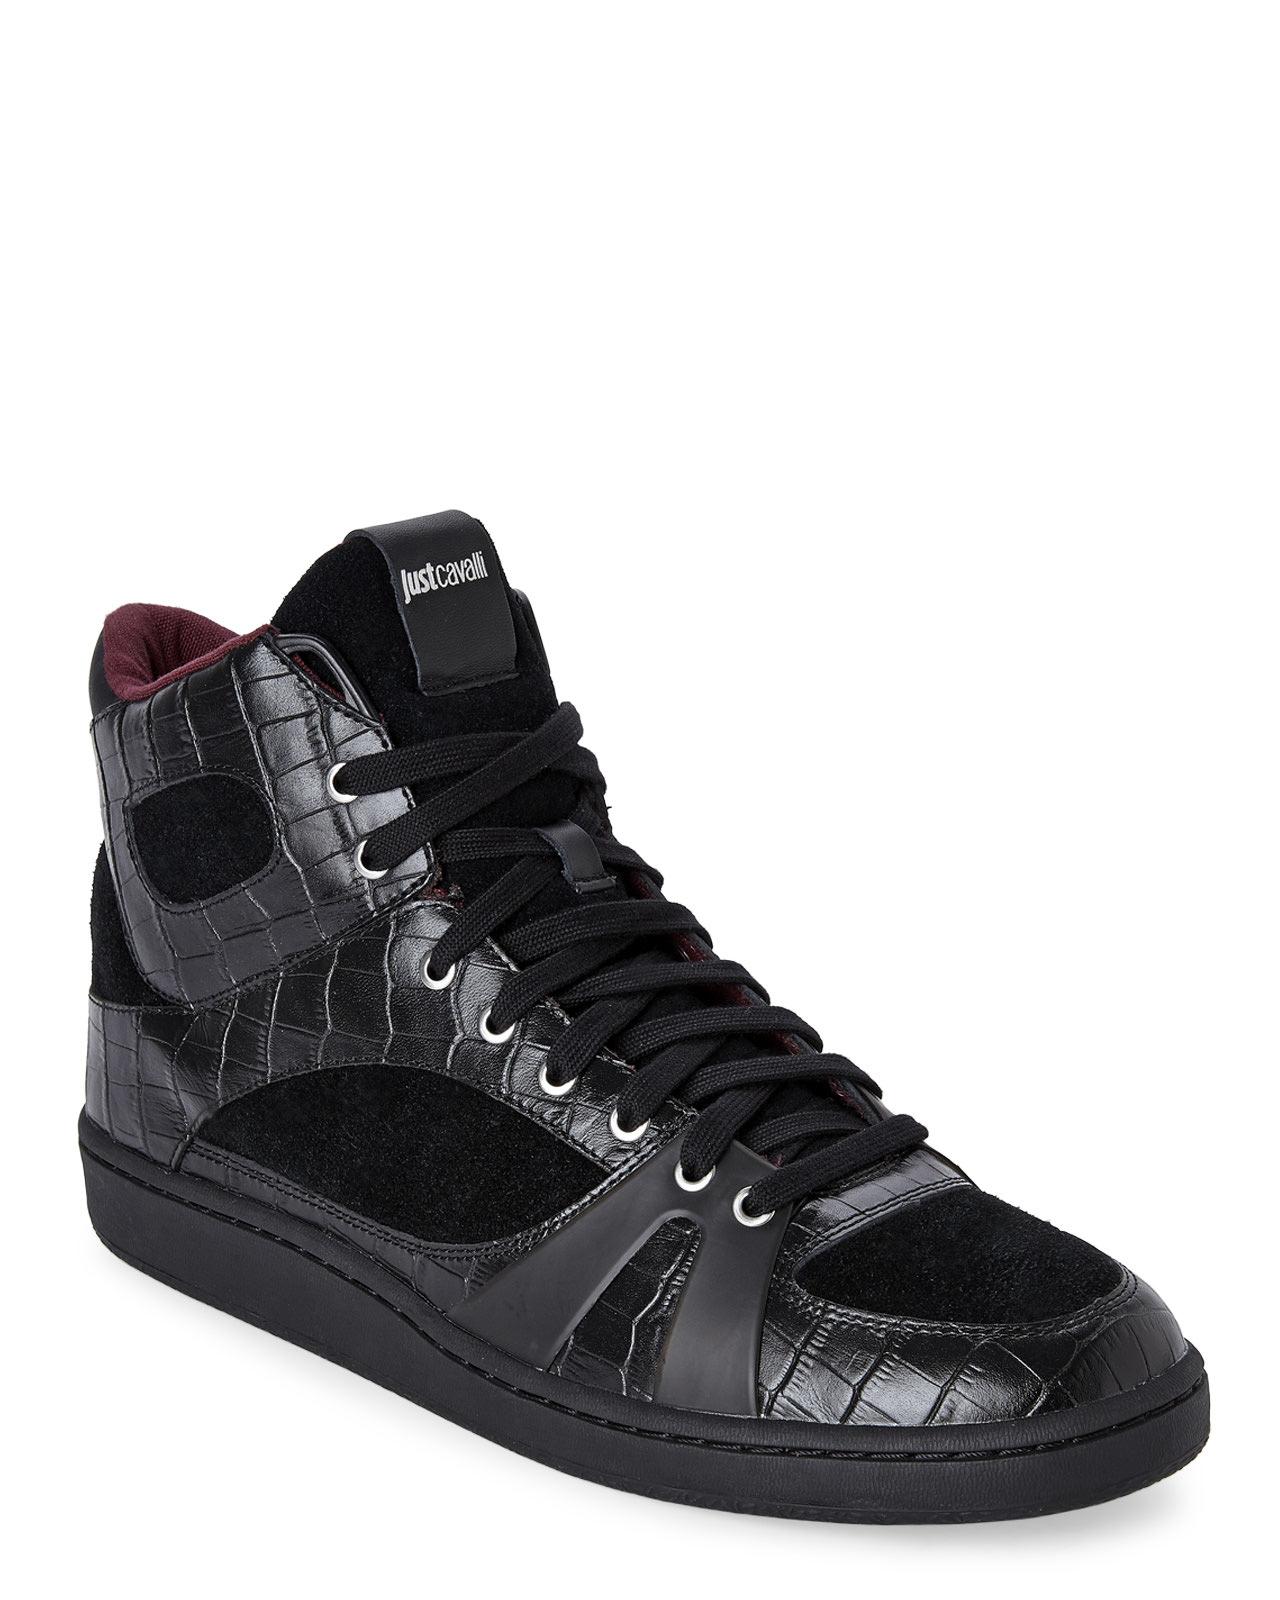 Juste Cavalli-tops Et Hauts Chaussures De Sport 4HgSzayKBG